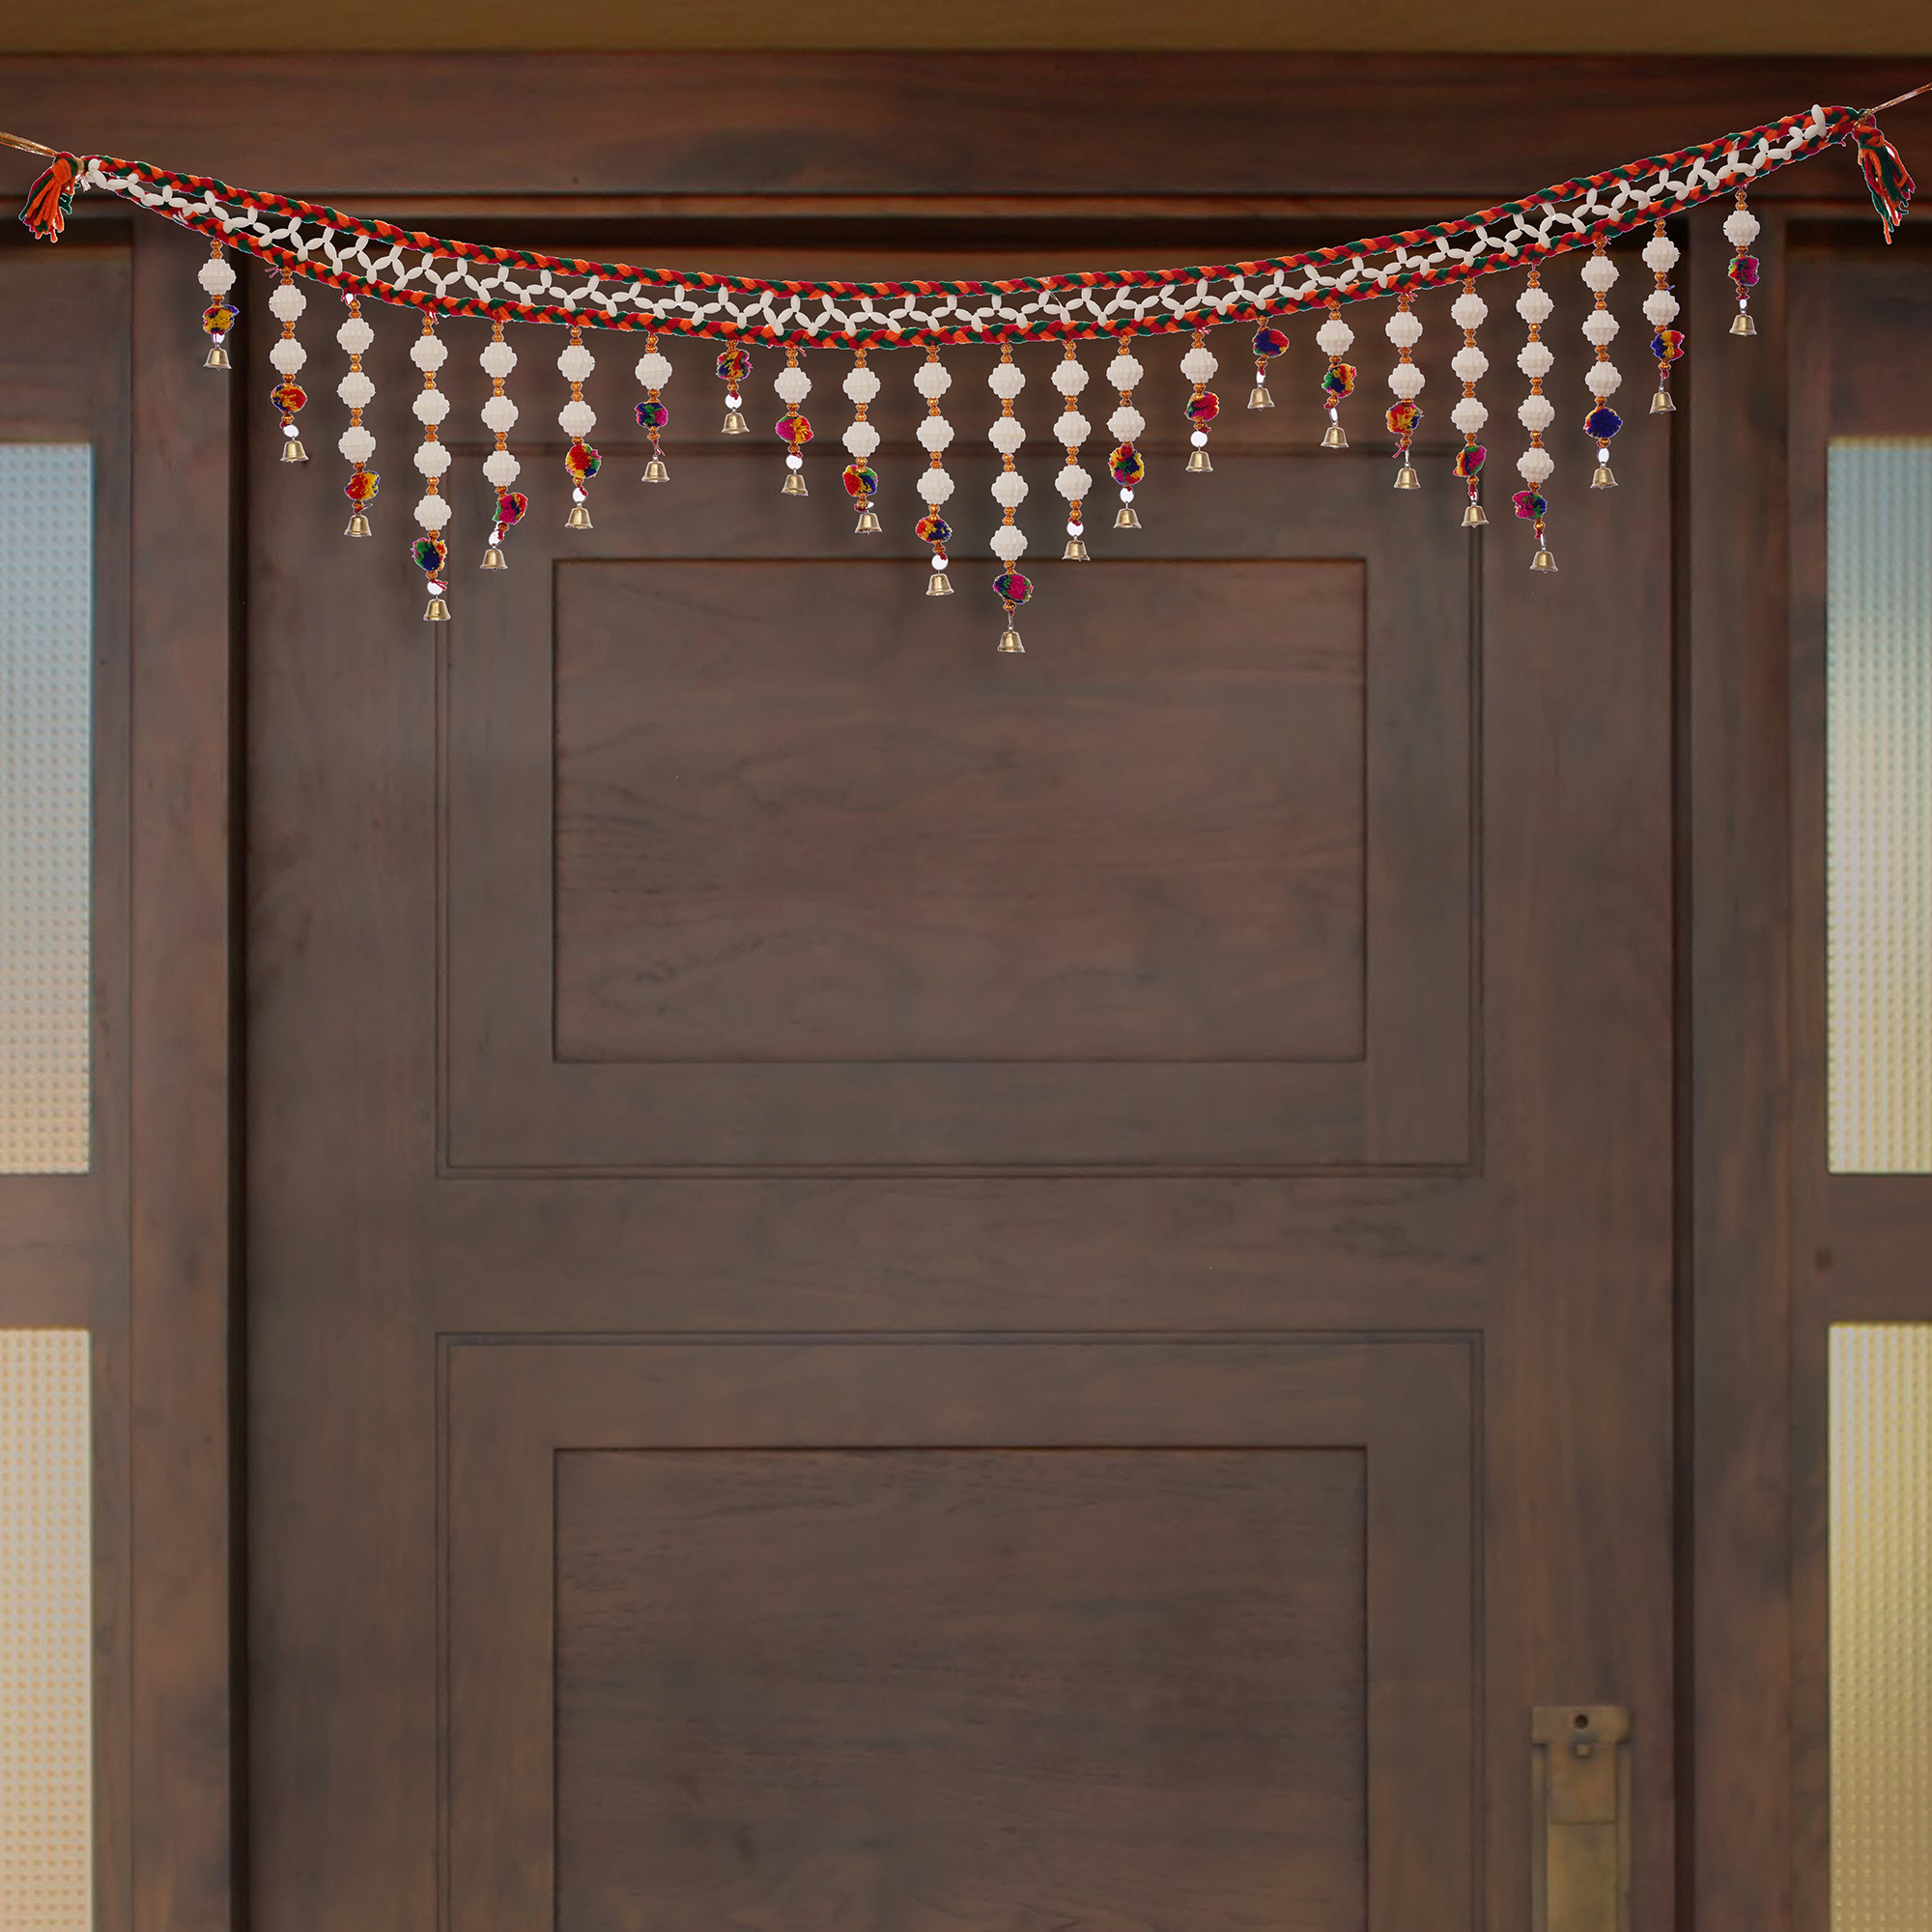 Decorative Colorful Bandarwal/Toran Door Hanging  with Shells Indian Home Decor